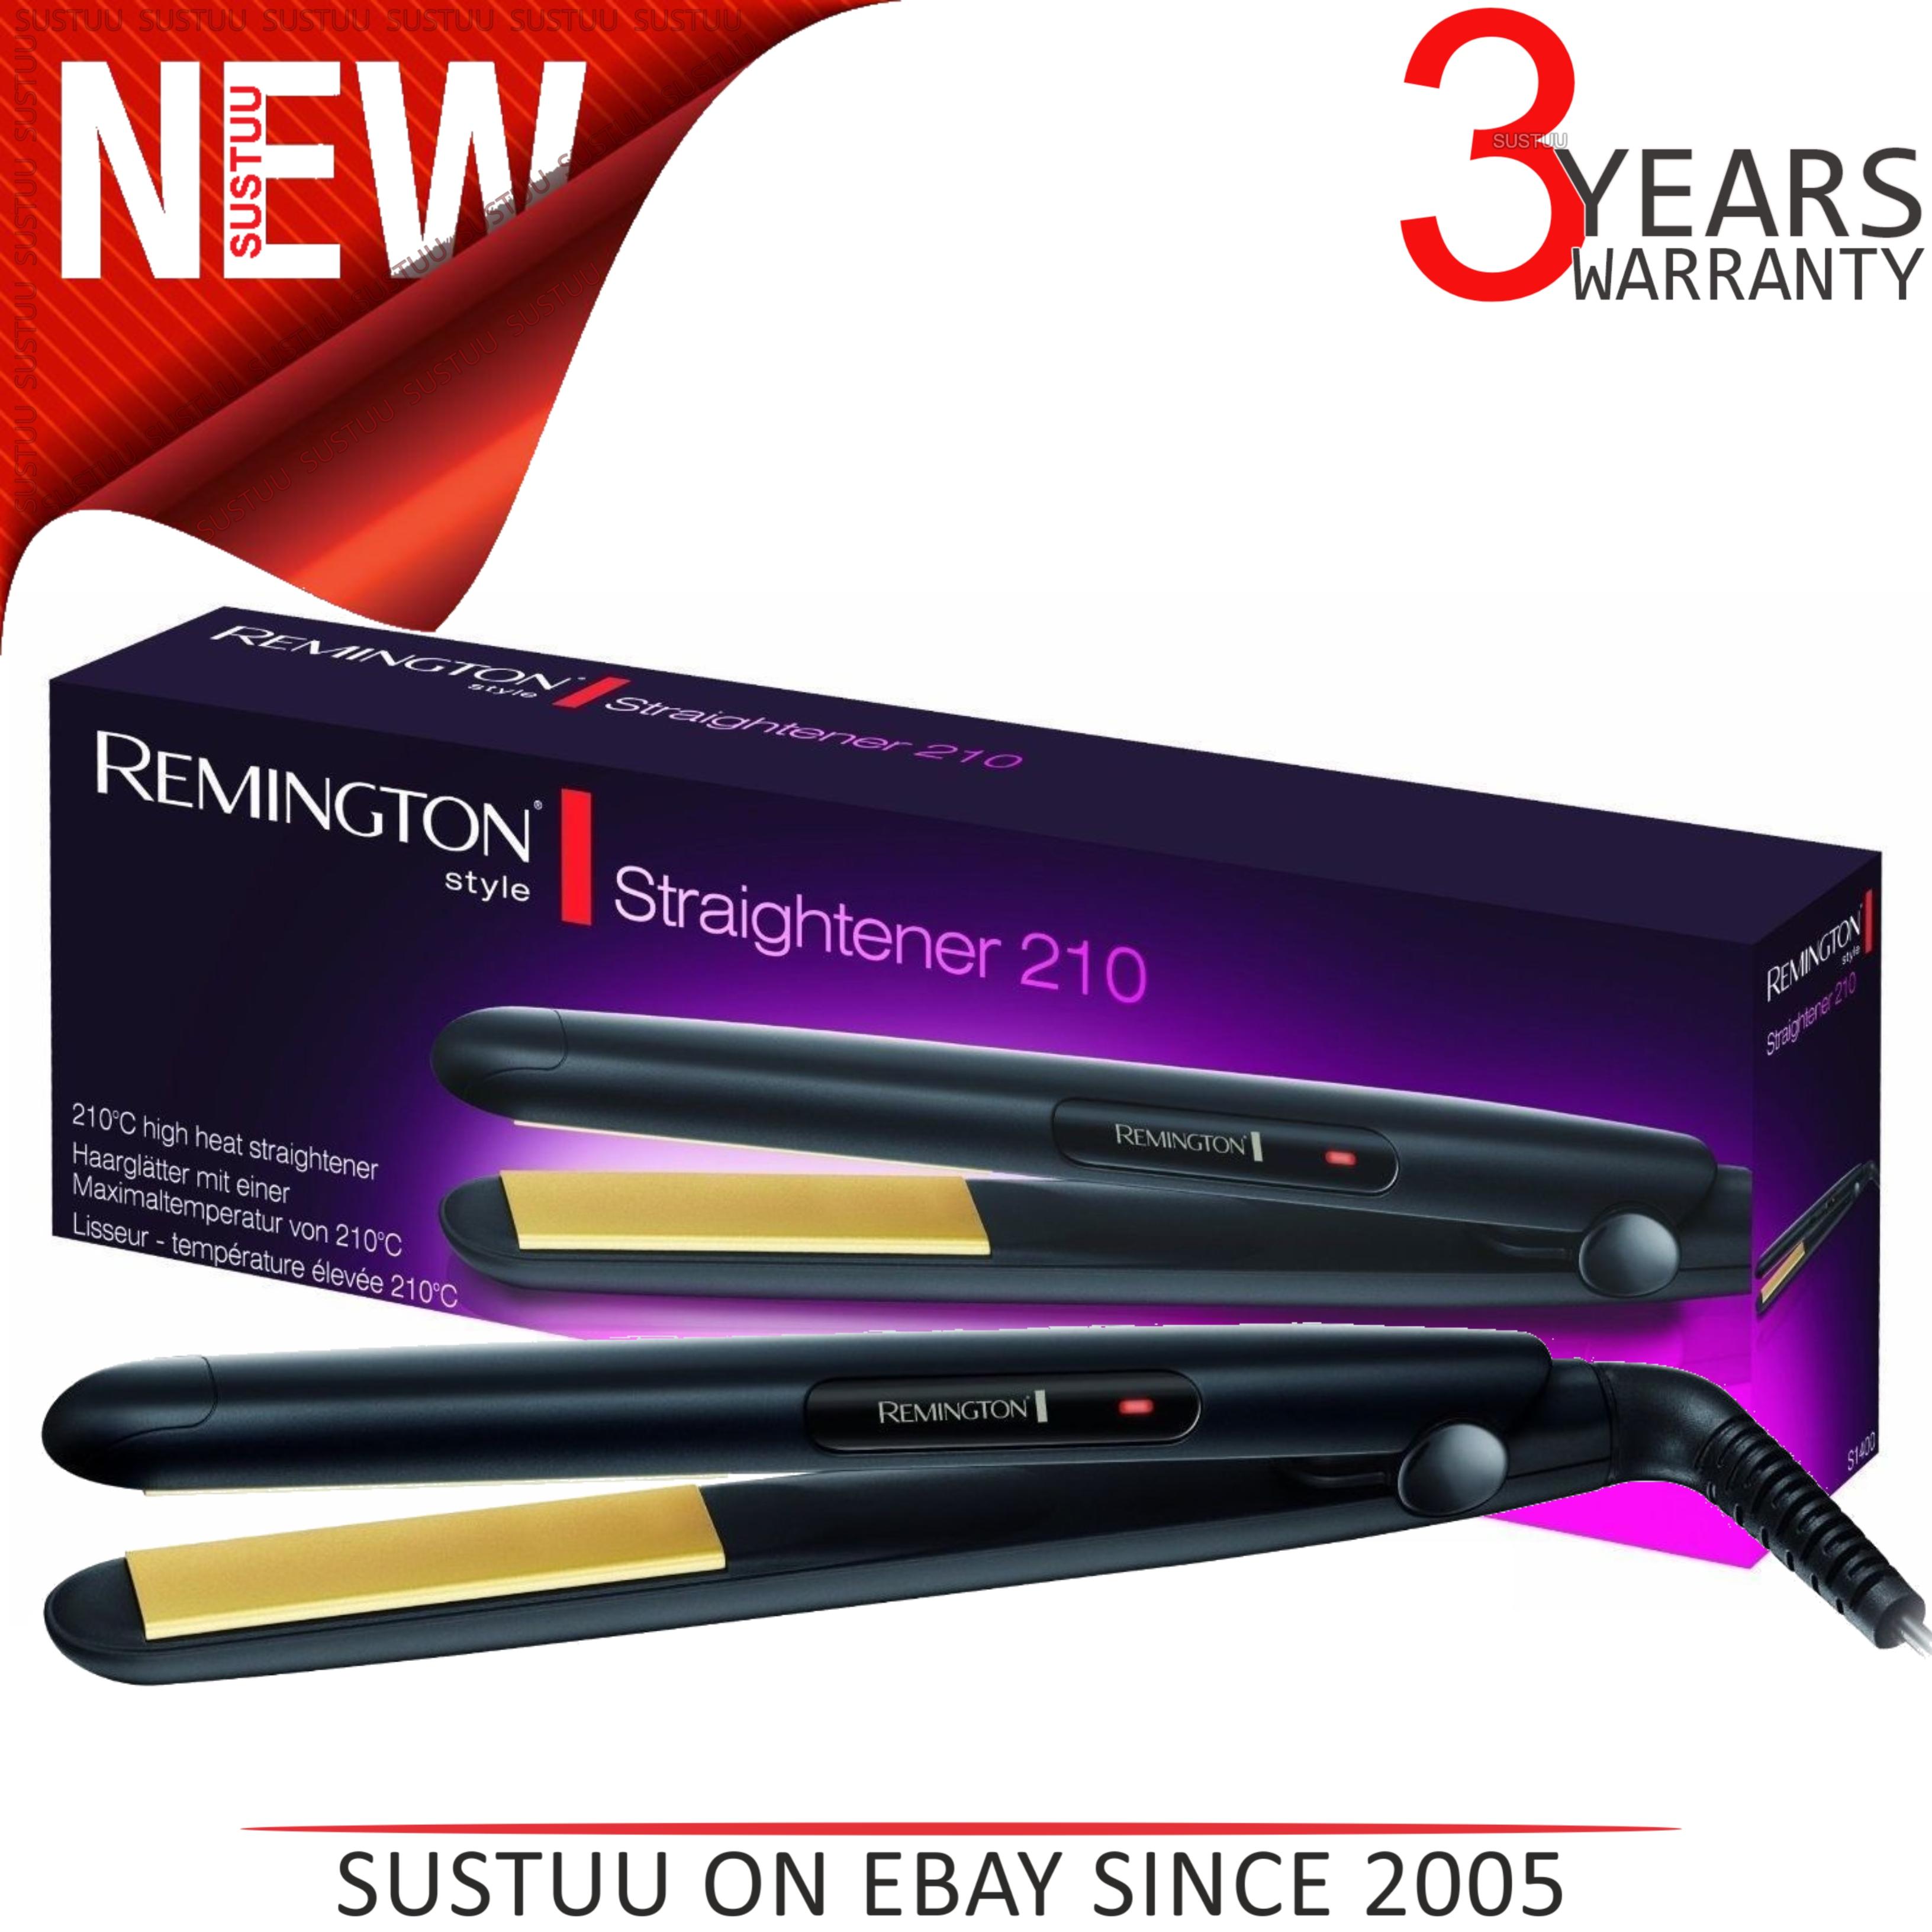 Remington S1400 Professional Ceramic Coated Women's Hair Straightener?210°C?NEW